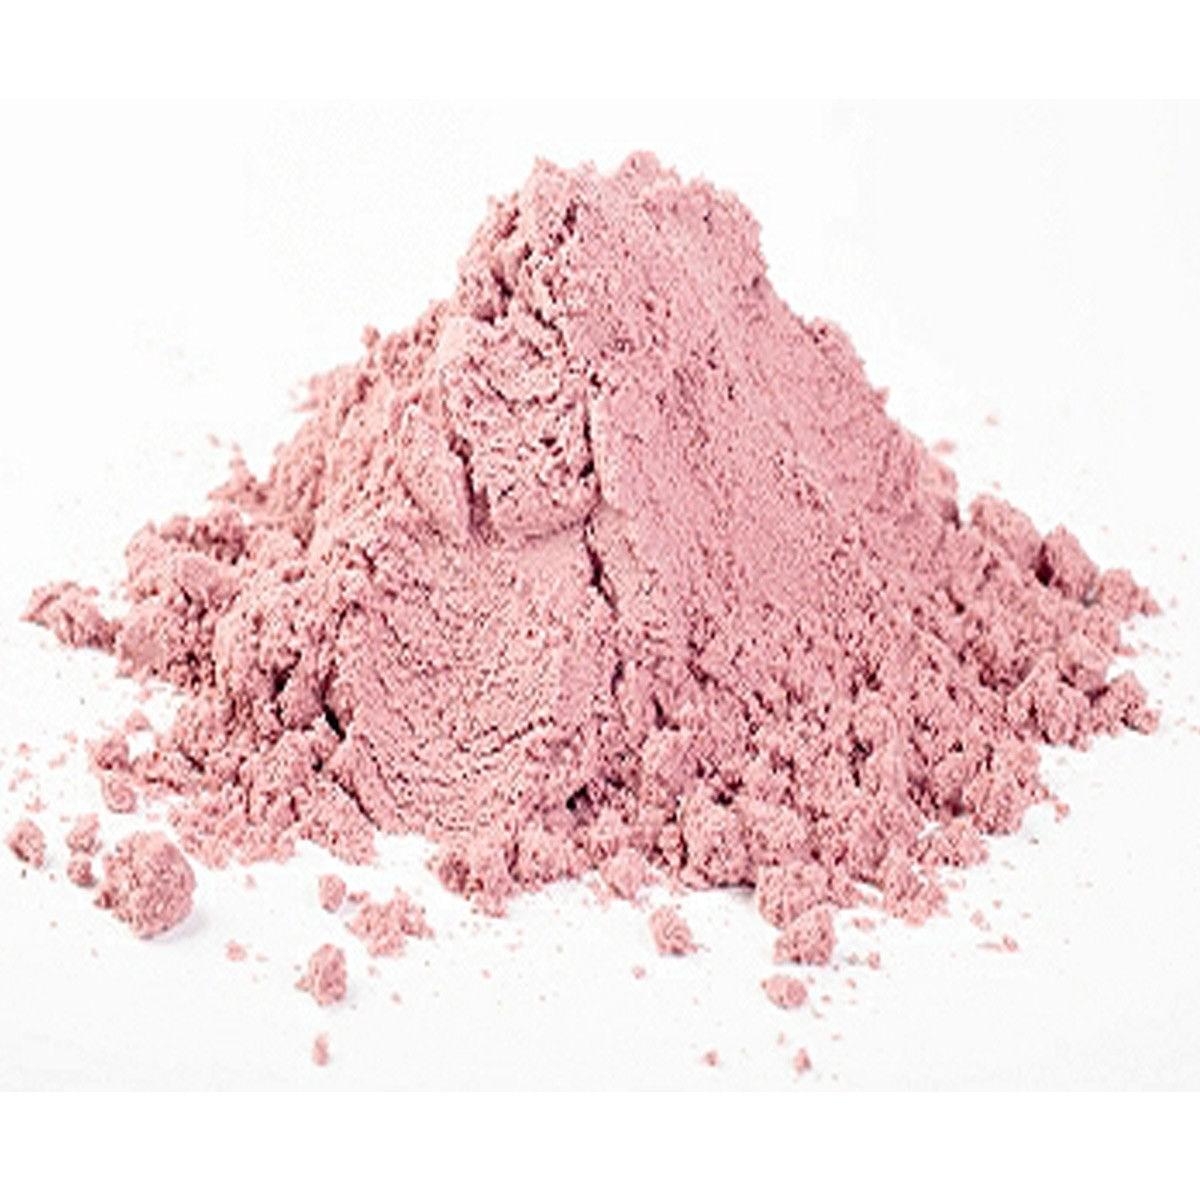 Pink Clay Powder